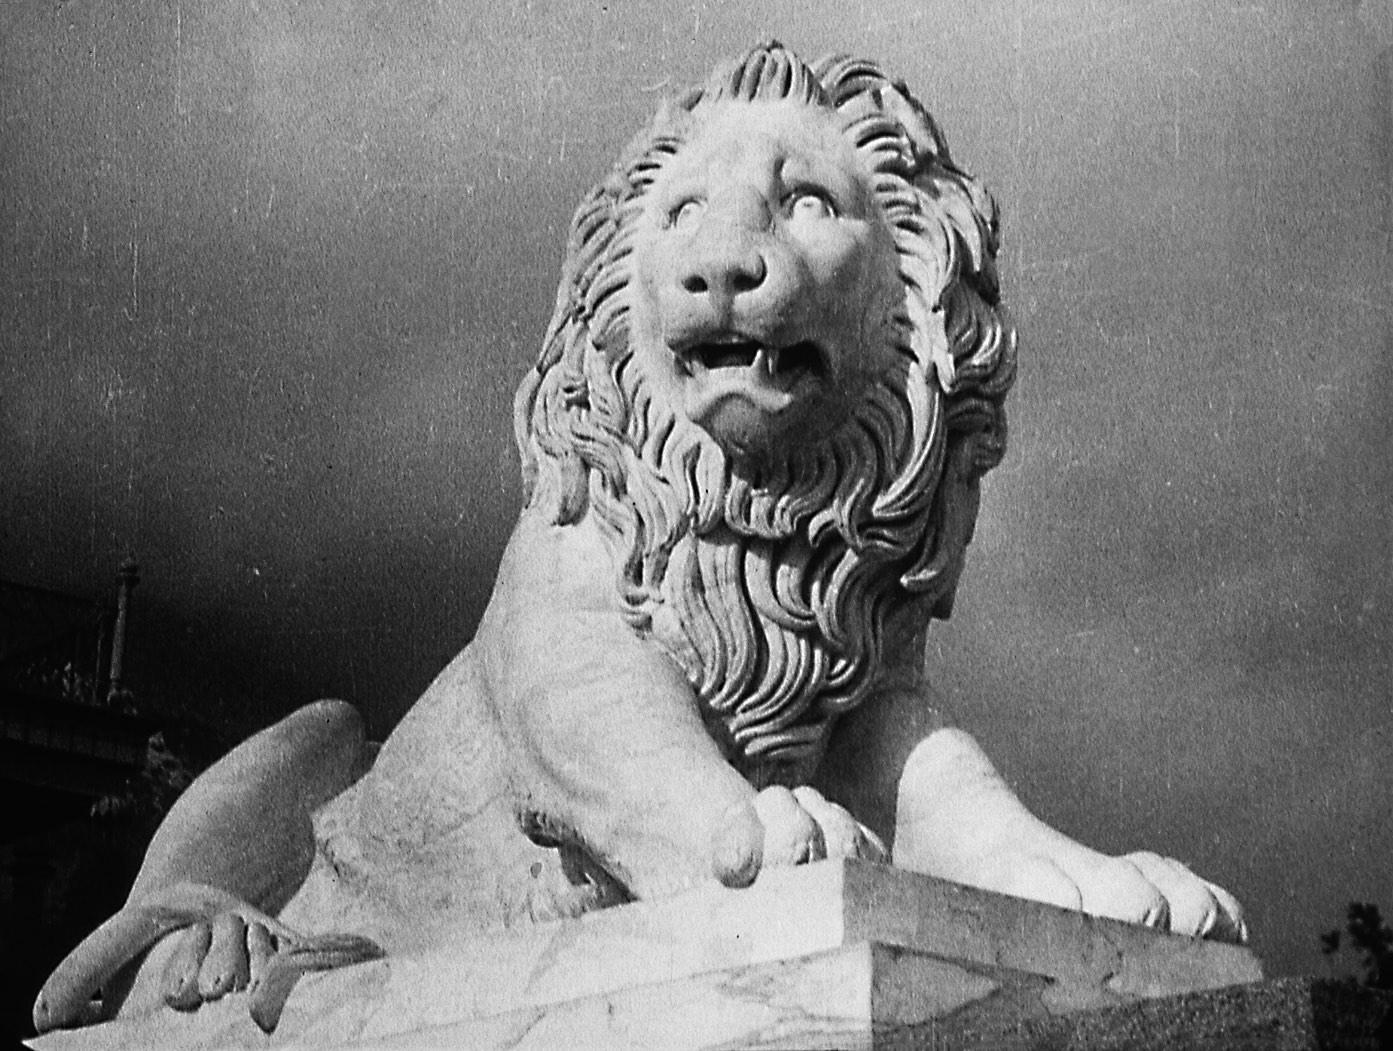 Lions from BATTLESHIP POTEMKIN